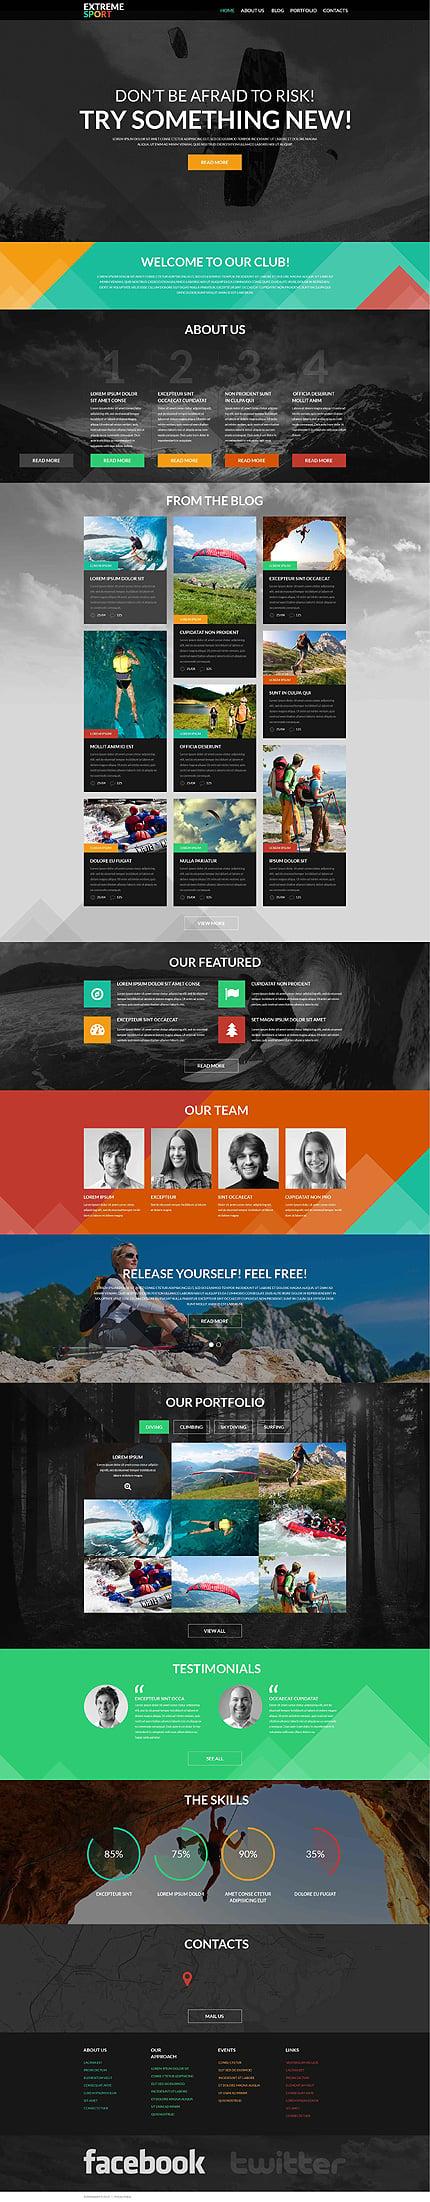 WordPress Theme/Template 51105 Main Page Screenshot